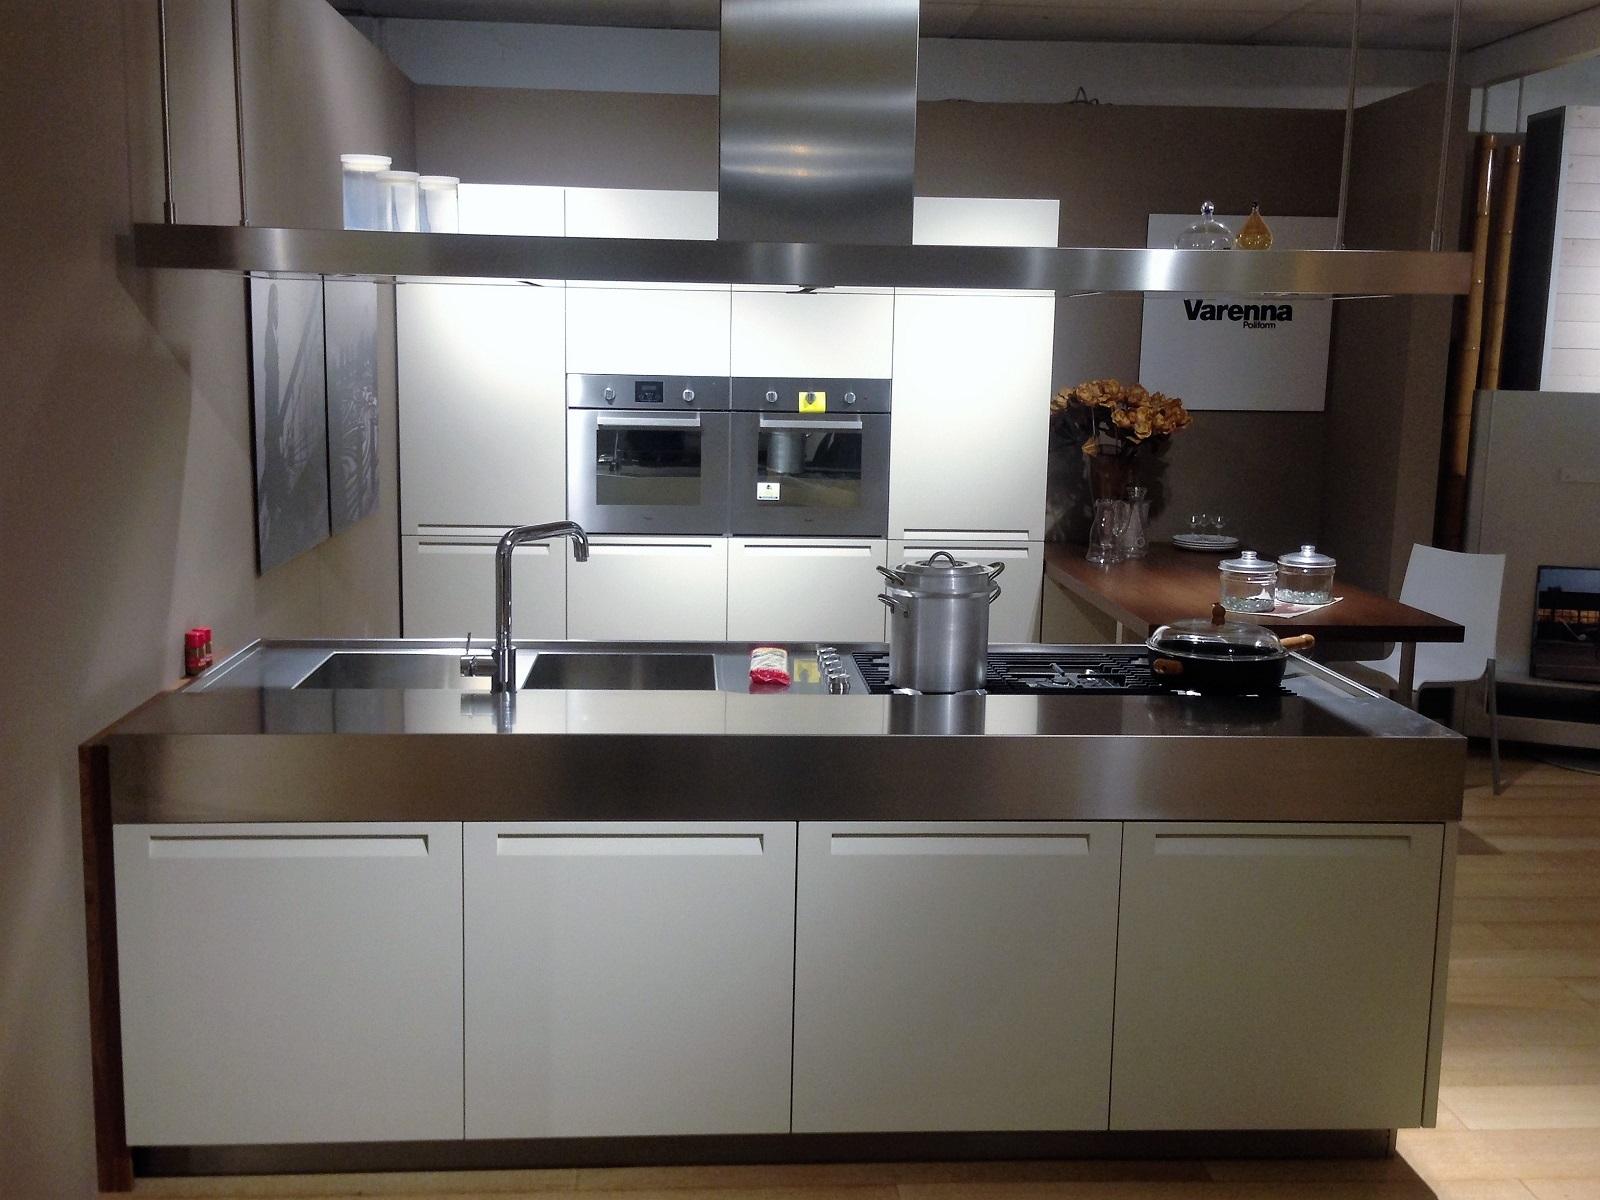 Minimal Cucine. Free City Cucine Componibili Cucine Febal Casa With ...